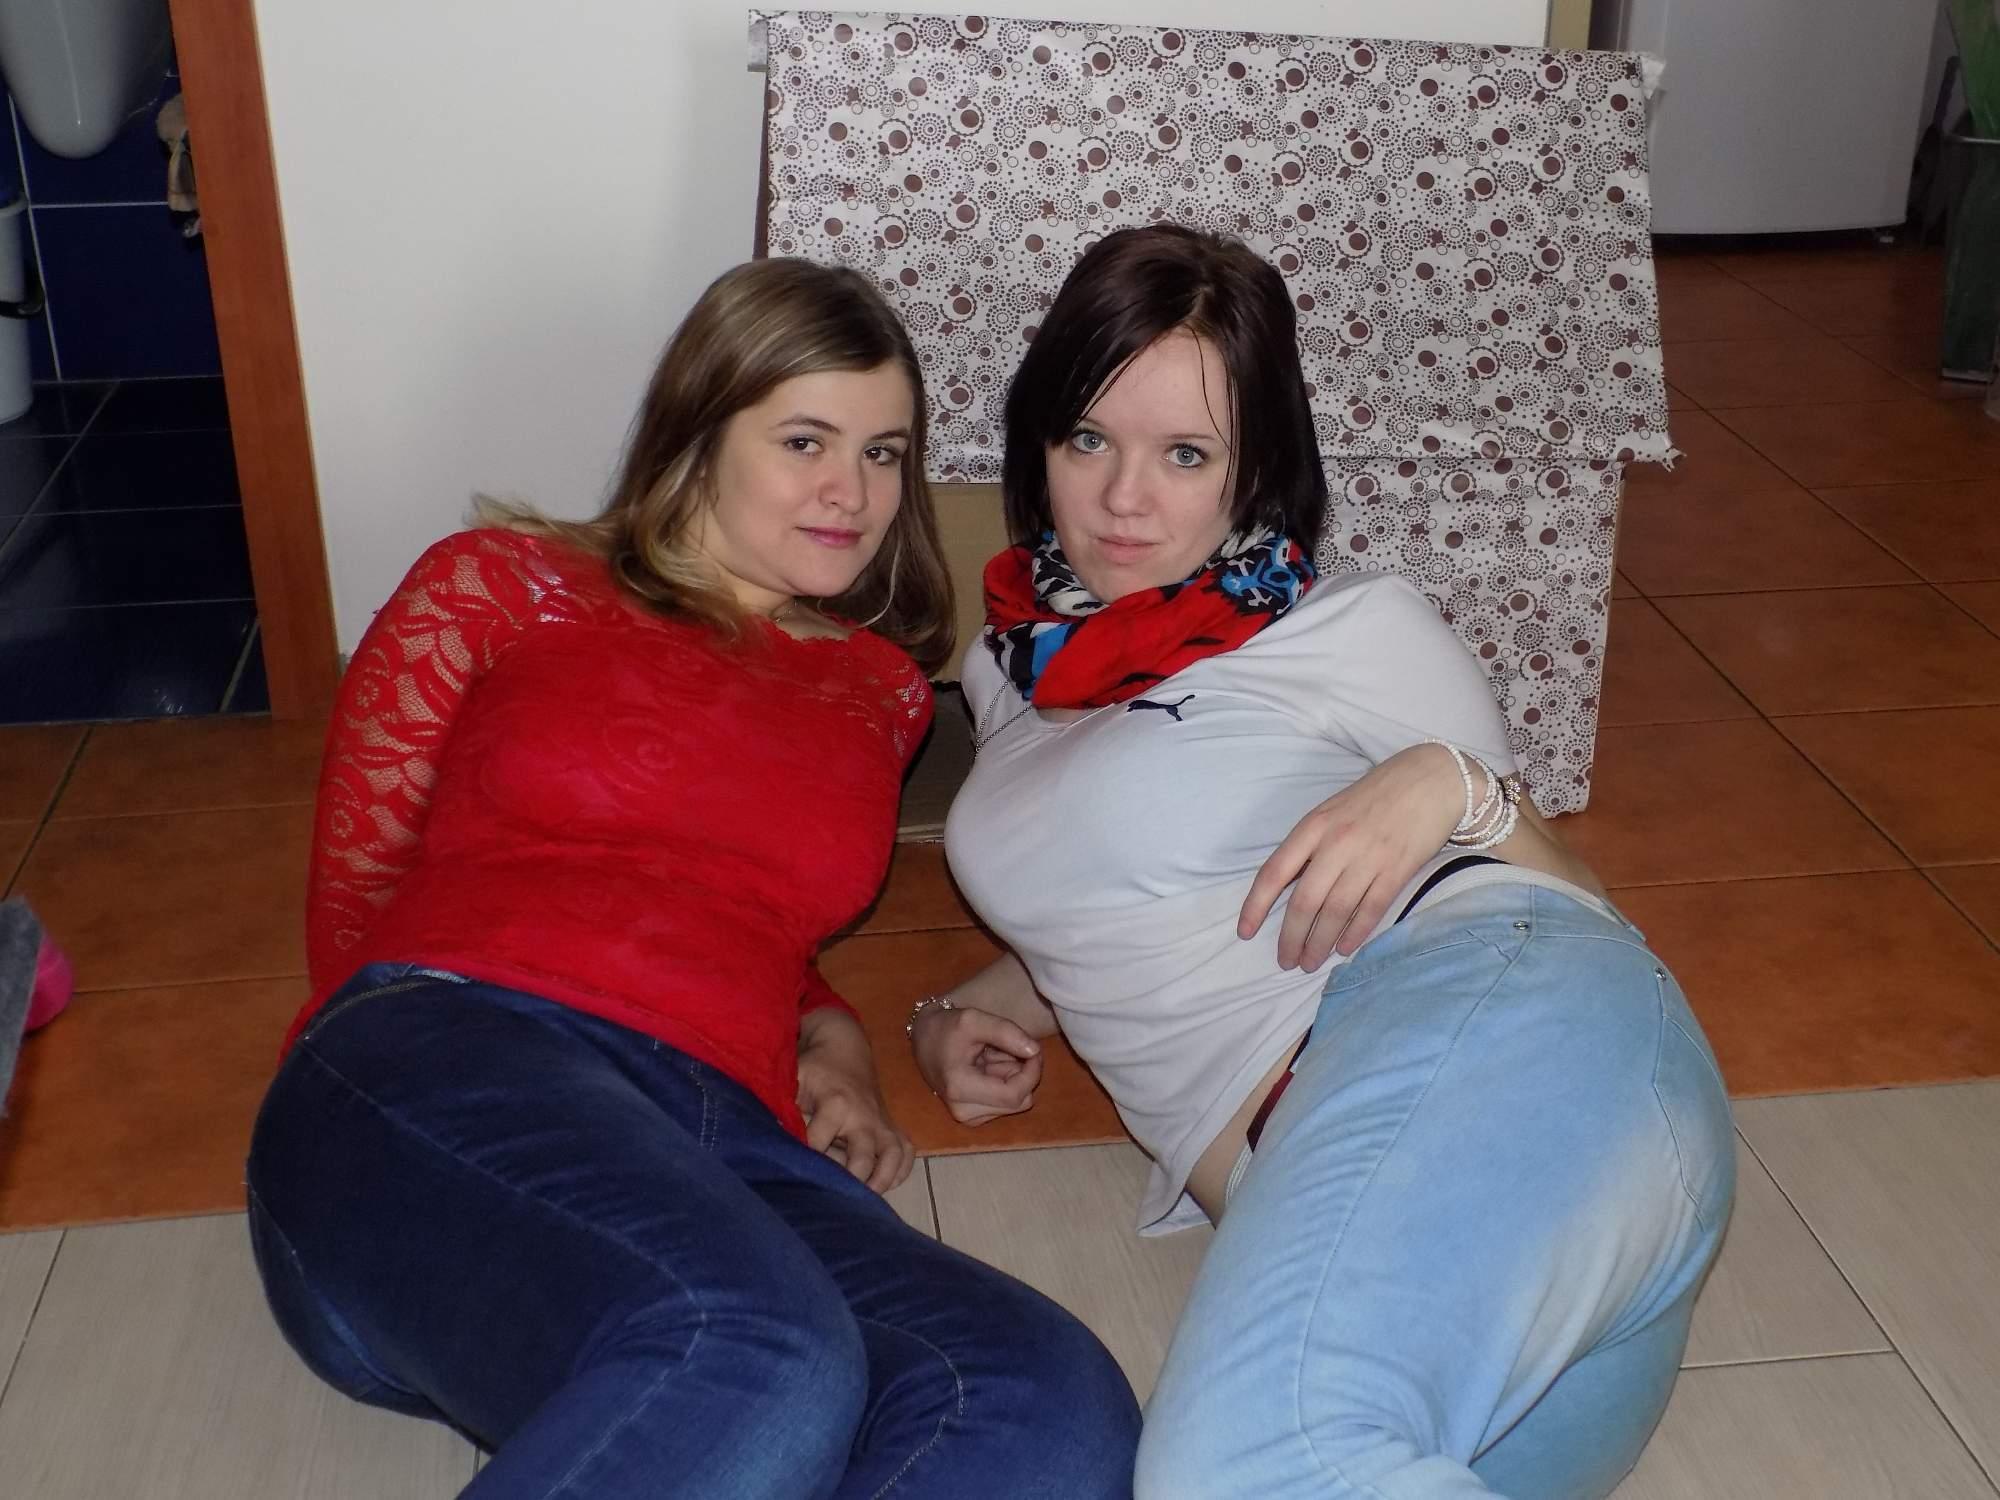 http://img25.rajce.idnes.cz/d2502/13/13862/13862137_c5559384bb63a400f5d8327efbaafba8/images/DSCN1506.jpg